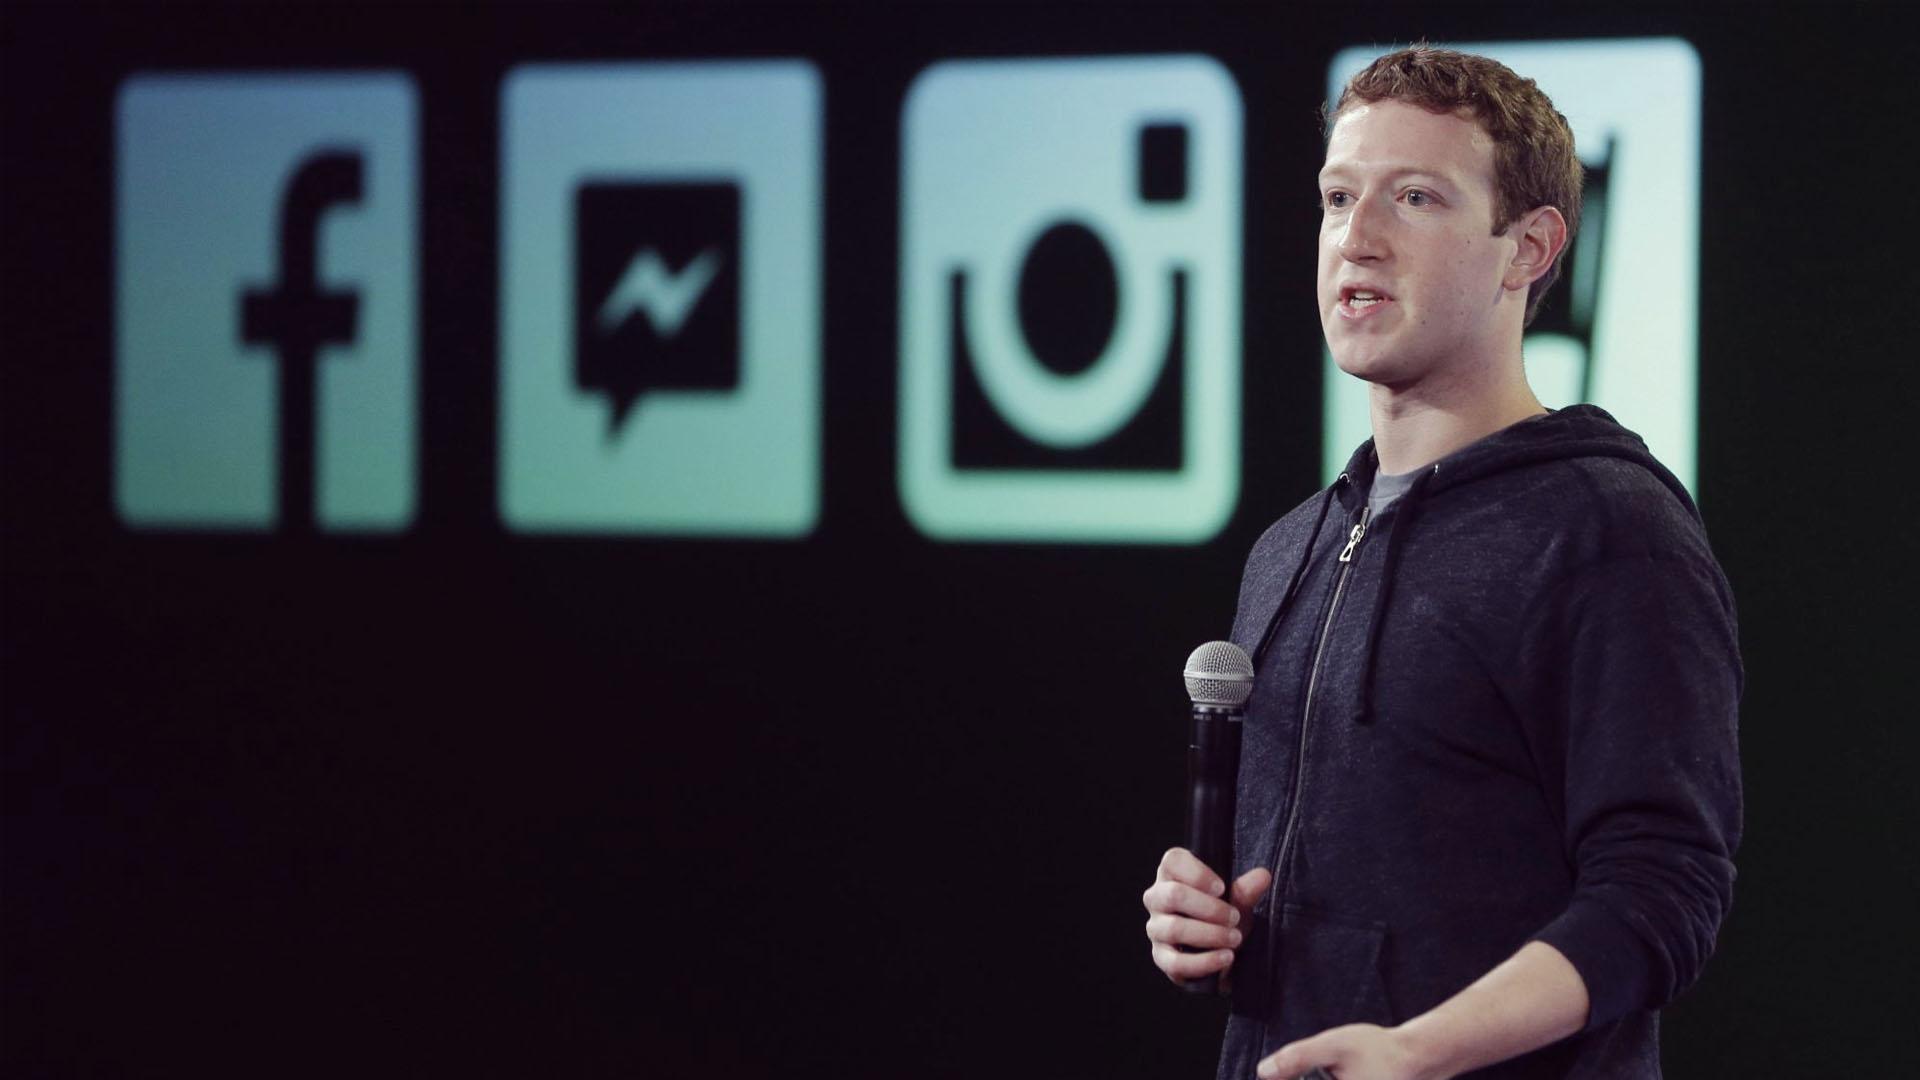 download image mark zuckerberg - photo #19